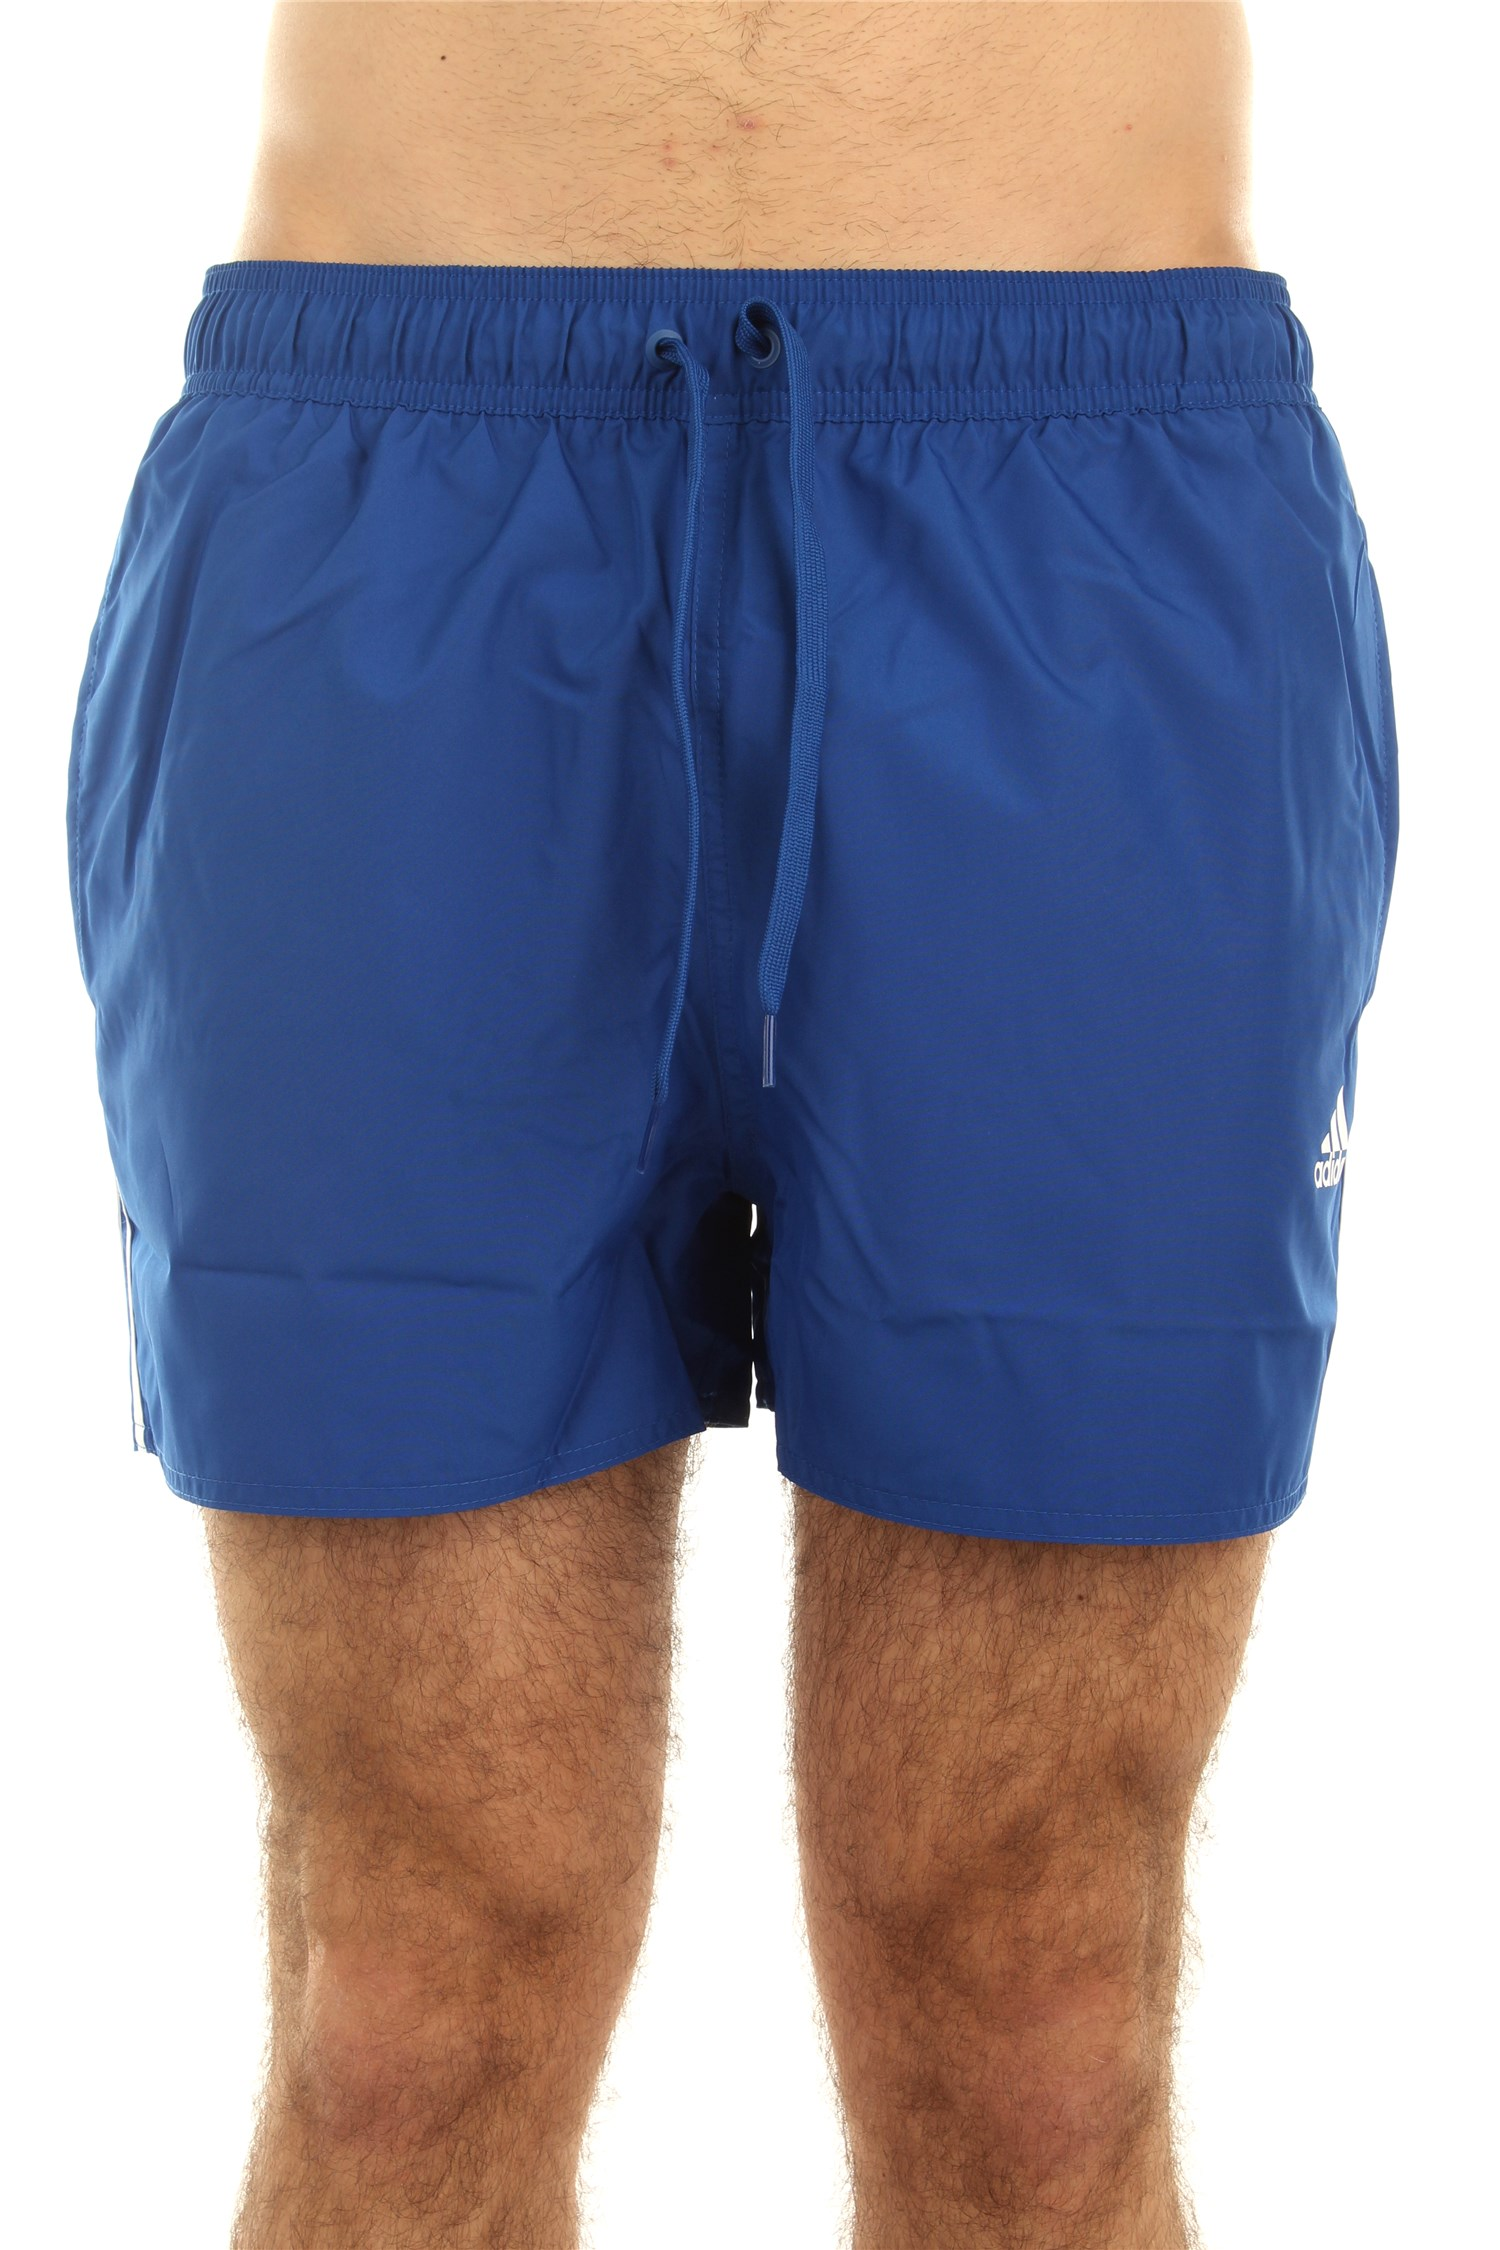 Adidas Swimwear Sea shorts Man Royblu